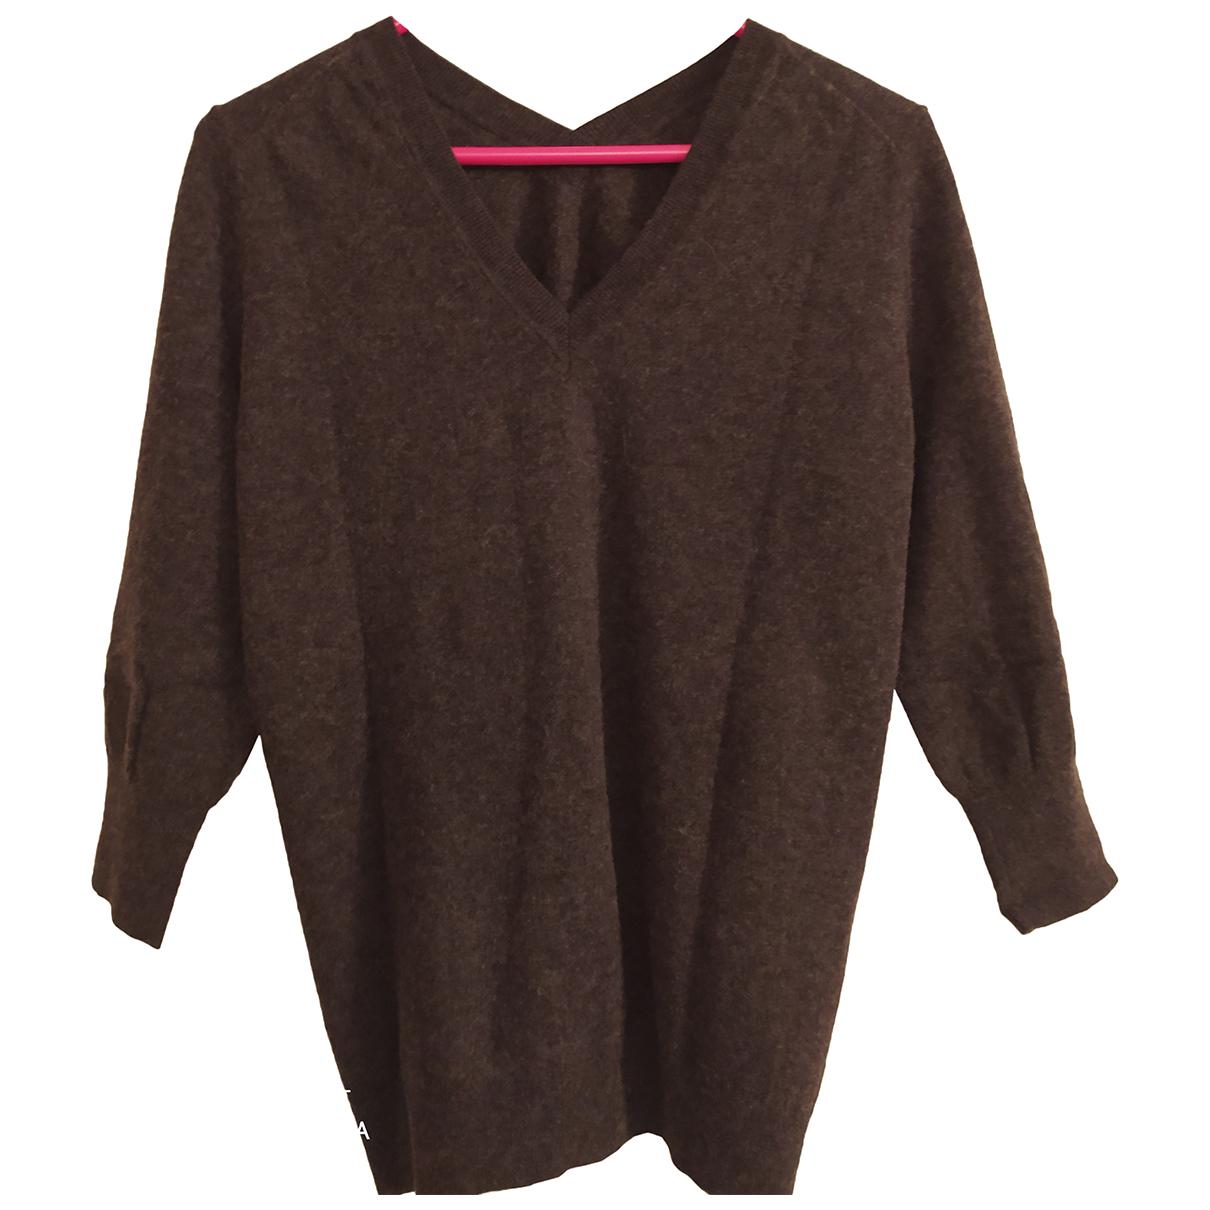 Isabel Marant Etoile N Anthracite Wool Knitwear for Women 40 FR